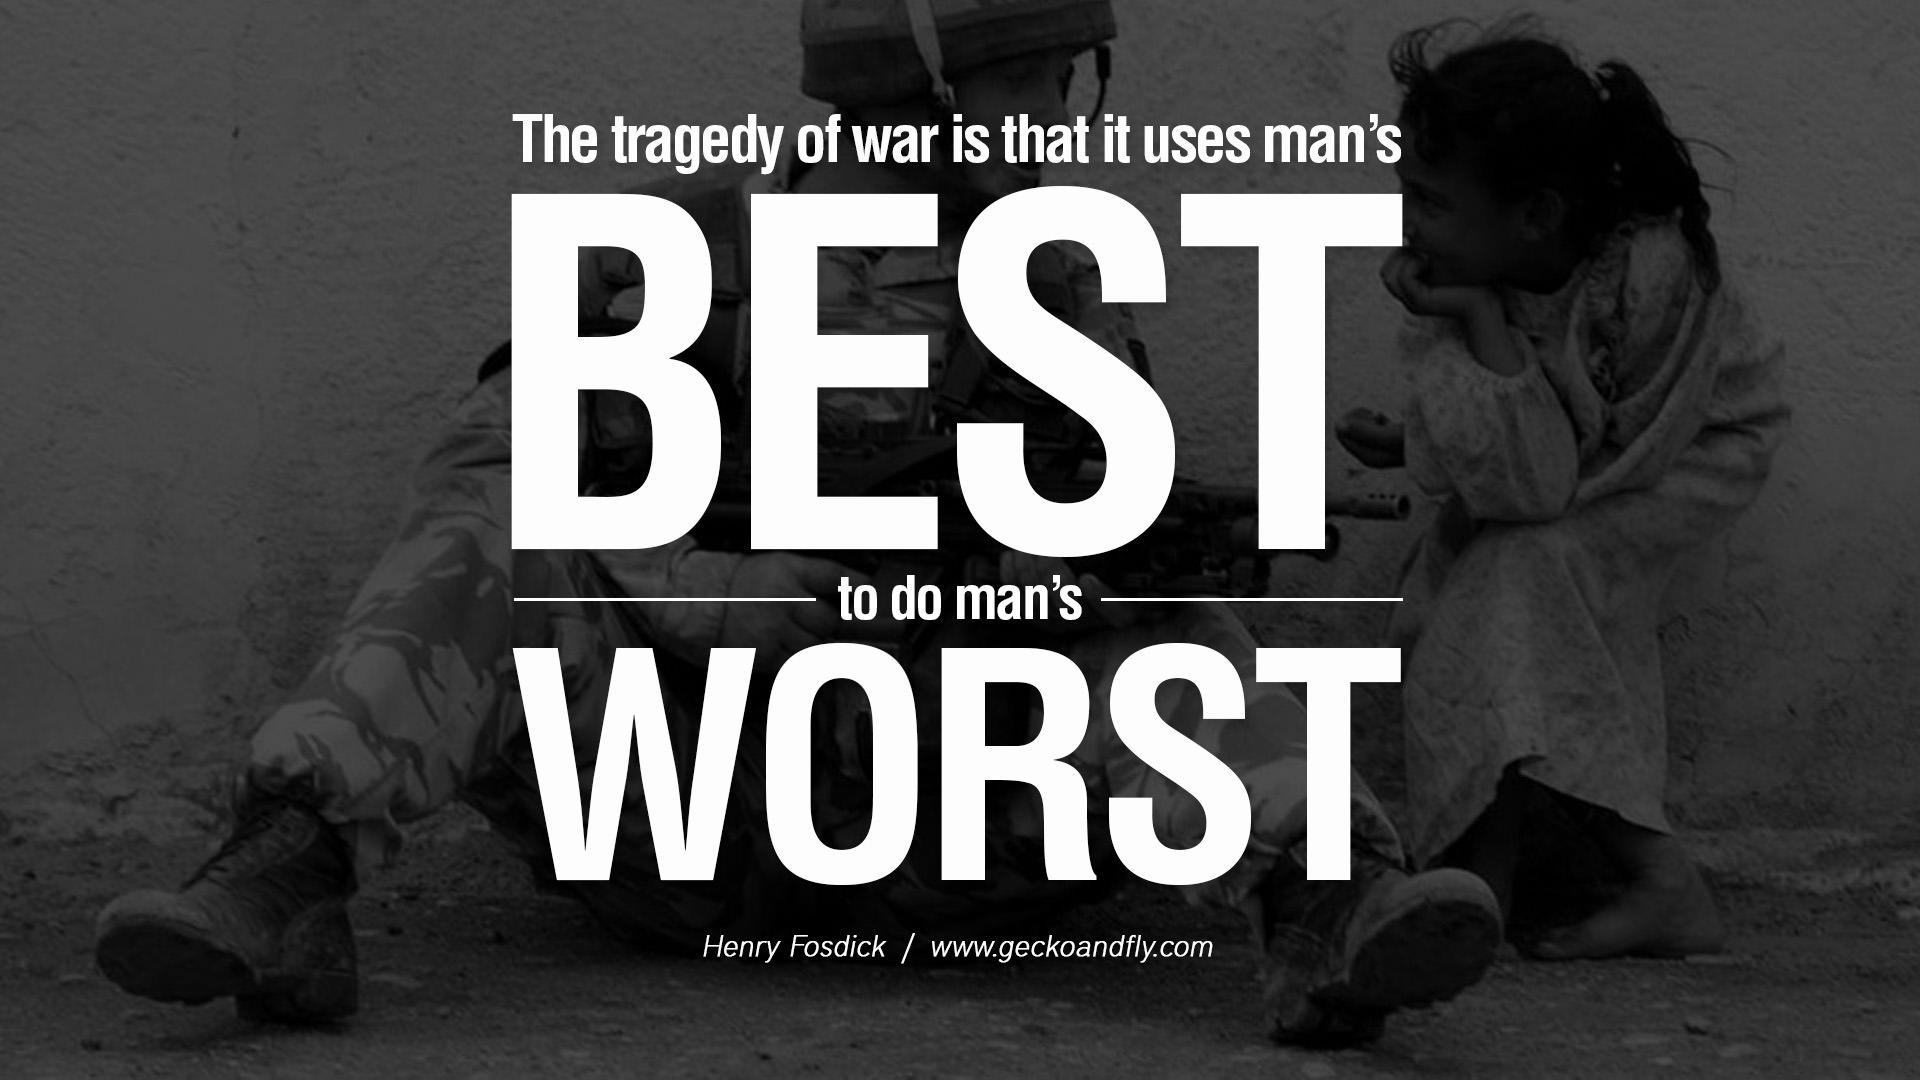 Quotes About Violence | Quotes About Violent Deaths 45 Quotes